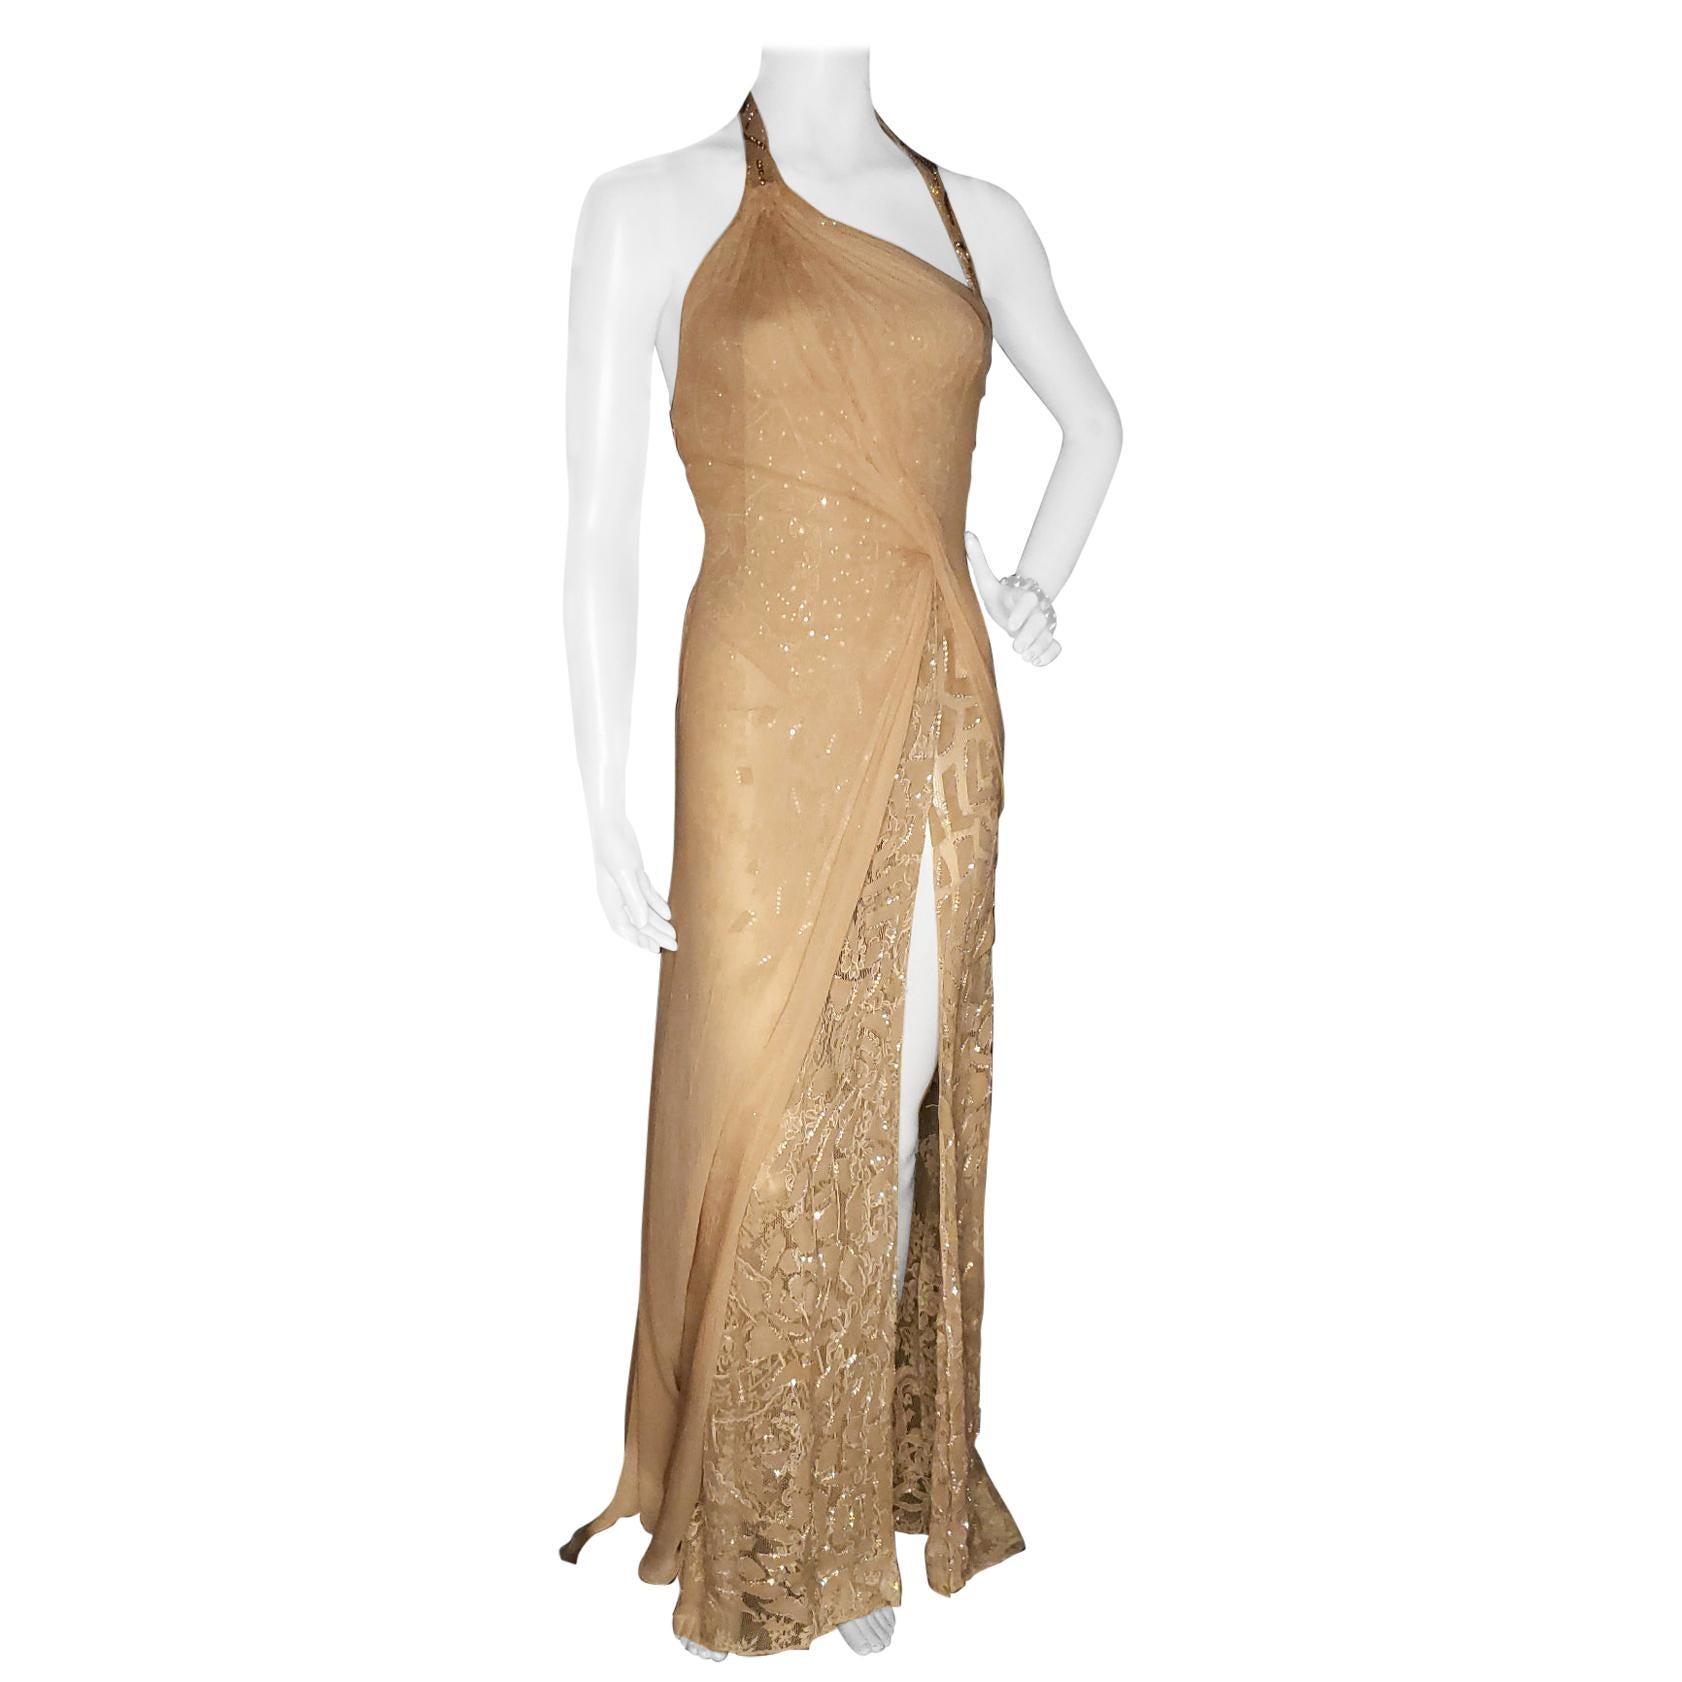 Vintage Versace Atelier Embellished Gown